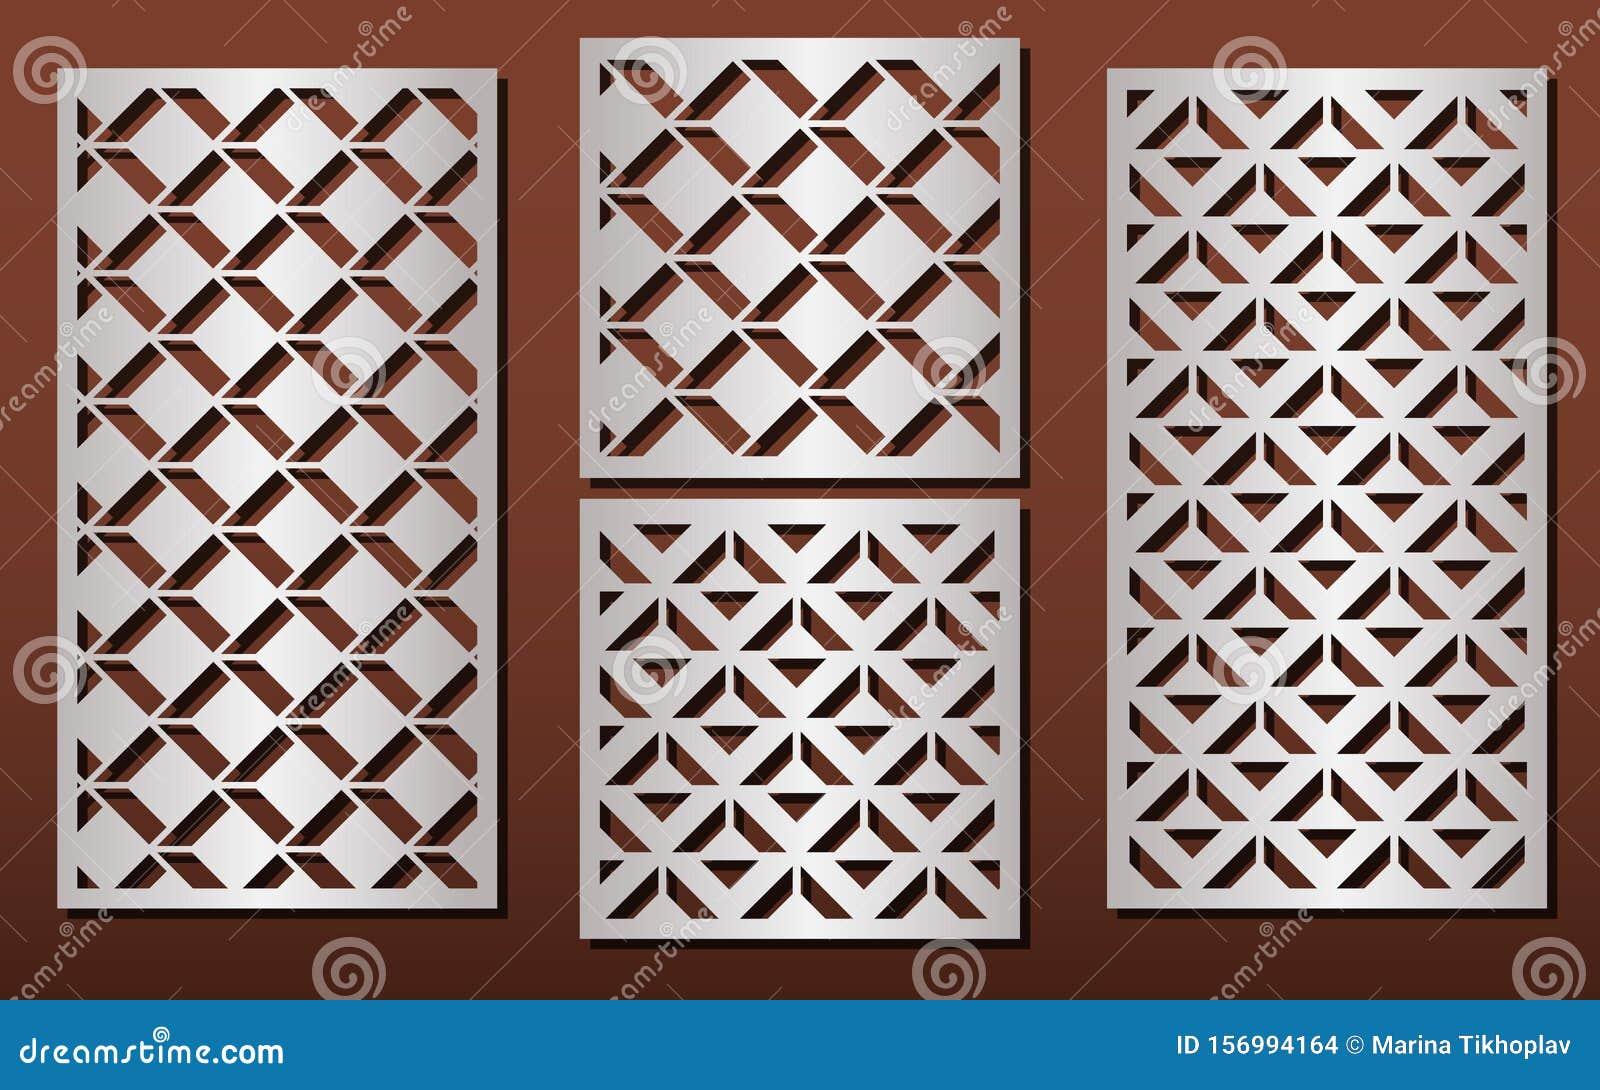 Laser Cut Panels Vector Set For Wood Or Metal Decor Arabic Geometric Pattern Stock Vector Illustration Of Fretwork Grid 156994164